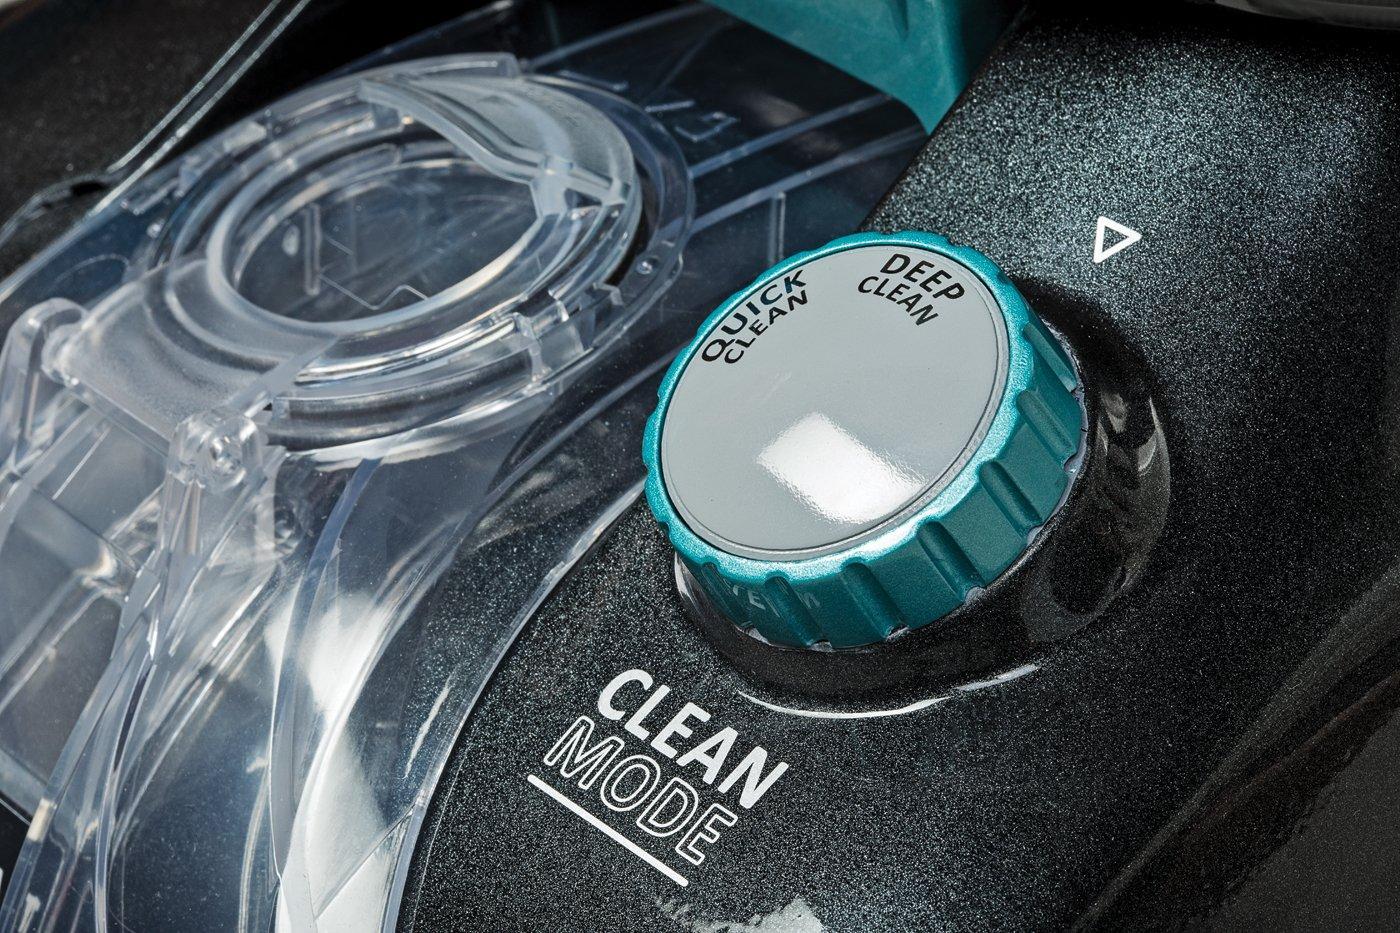 Power Scrub Elite Carpet Cleaner4